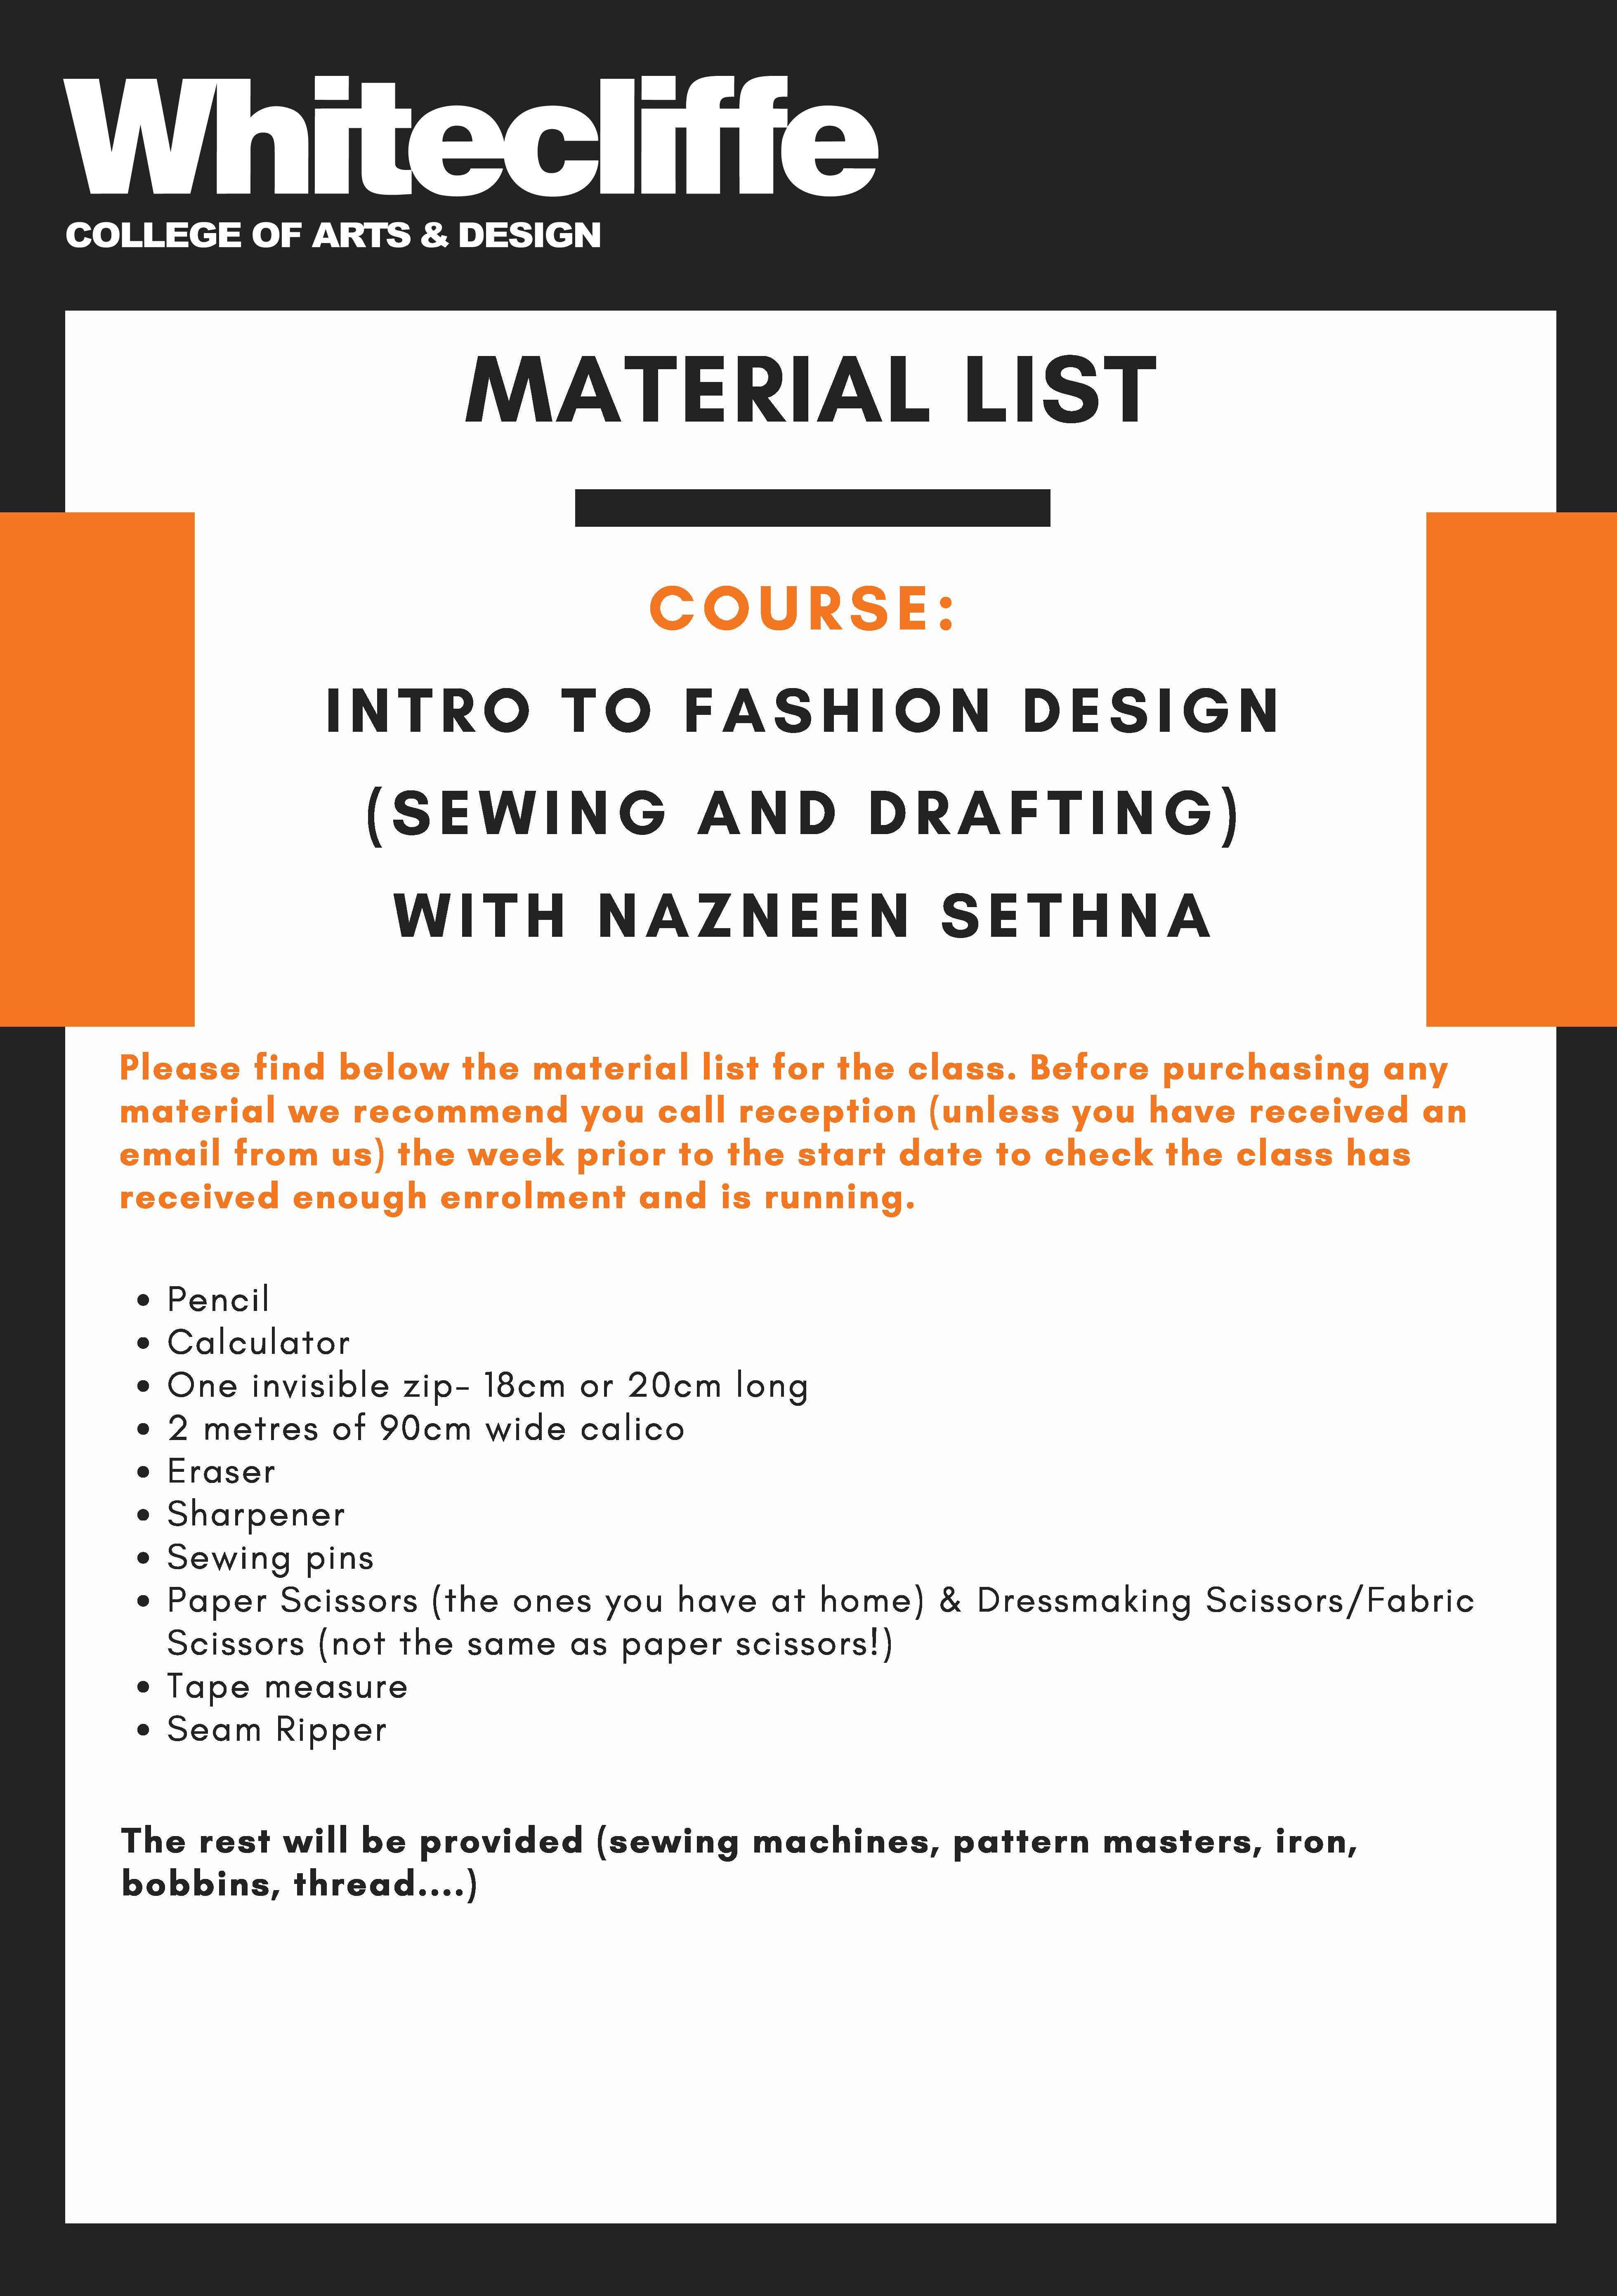 Intro Fashion Design Evening Course With Nazneen Sethna 6 Weeks Term 1 Wednesdays Alldesignevents